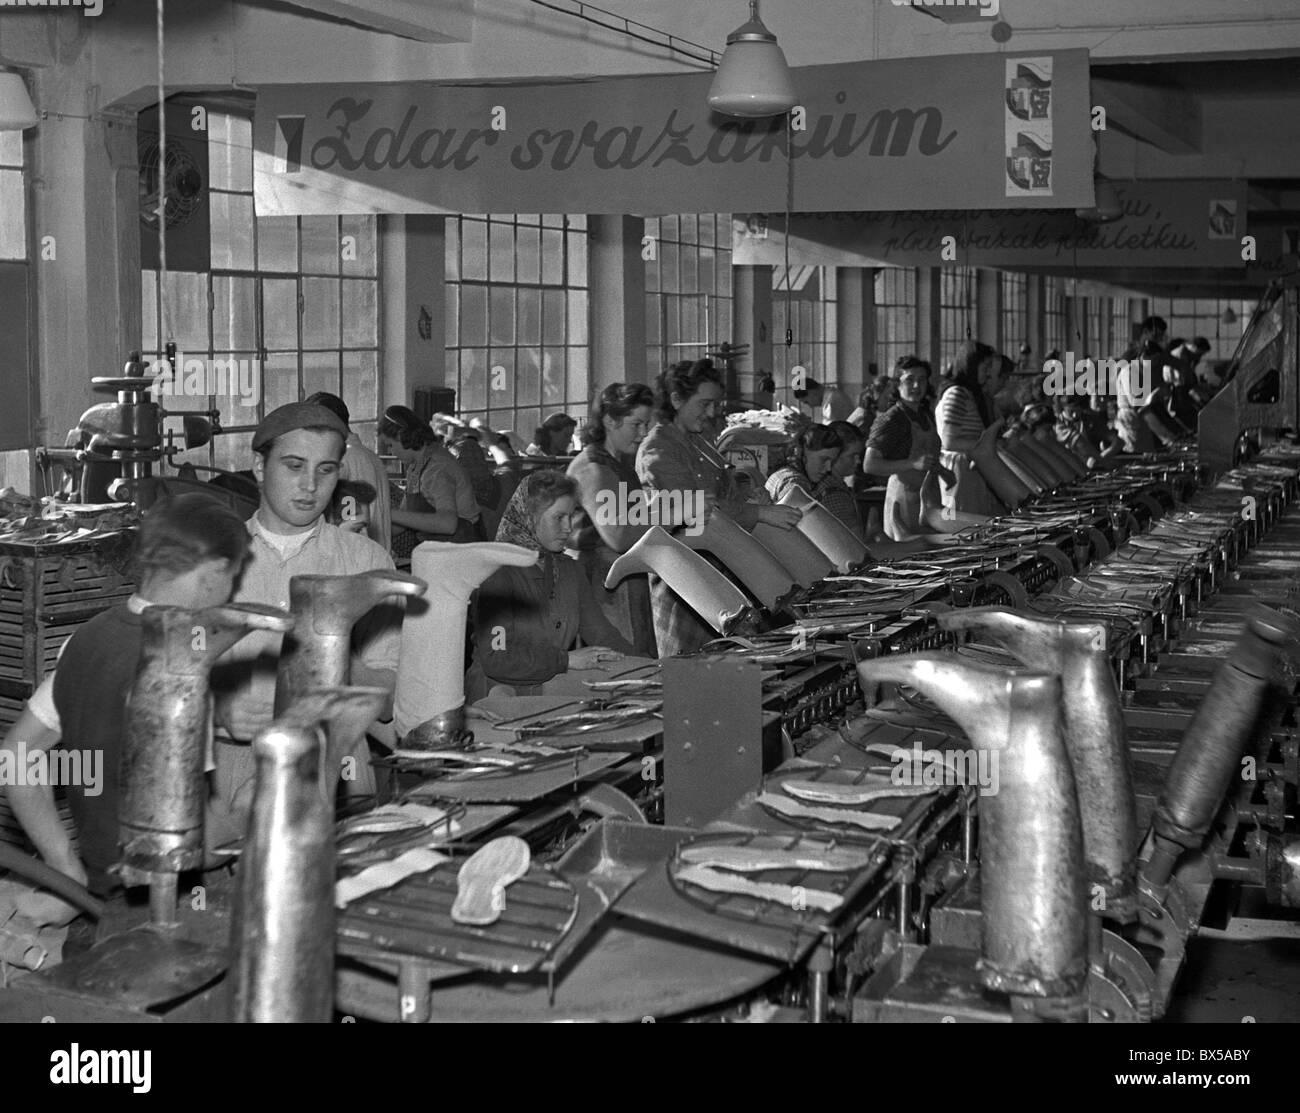 Shoe Factory: Gottwaldov 1950. Shoe Factory Workers